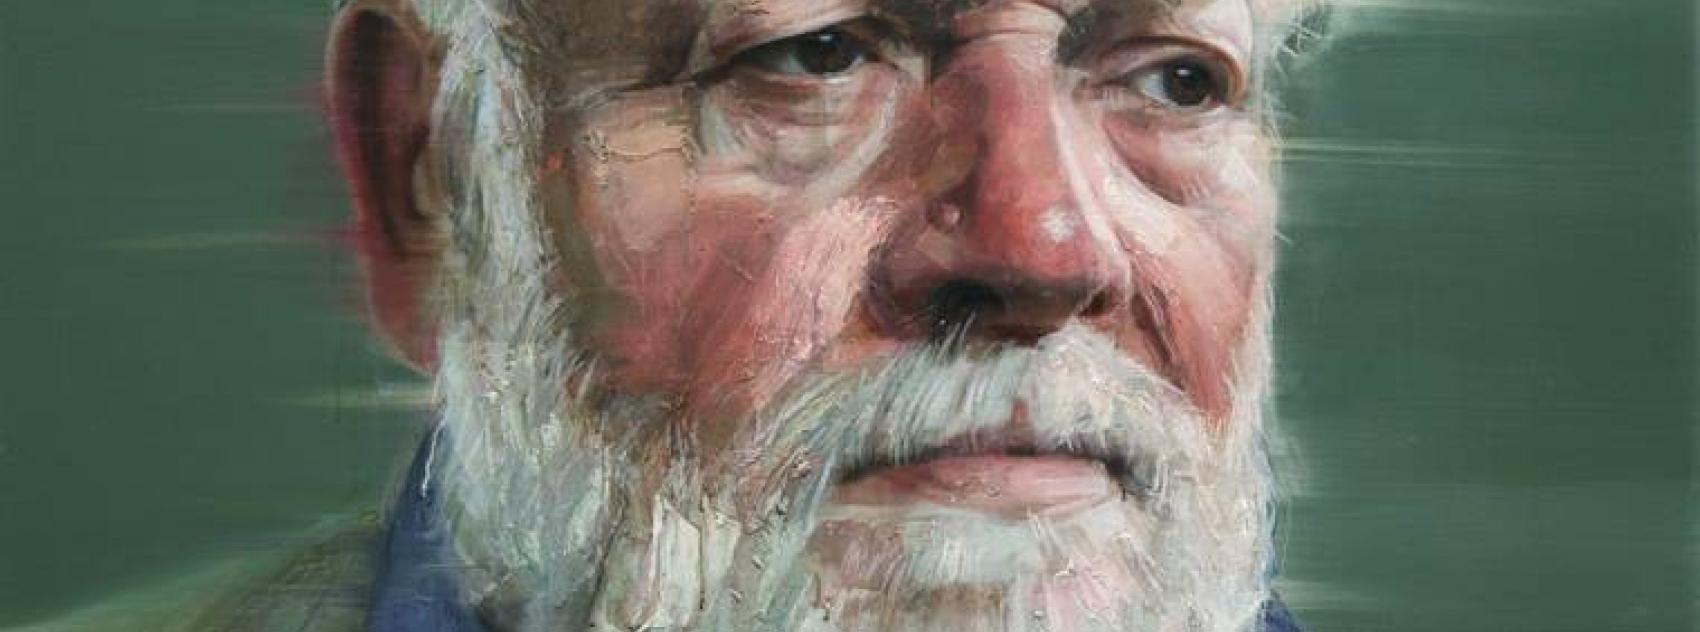 Michael Longley by Colin Davidson